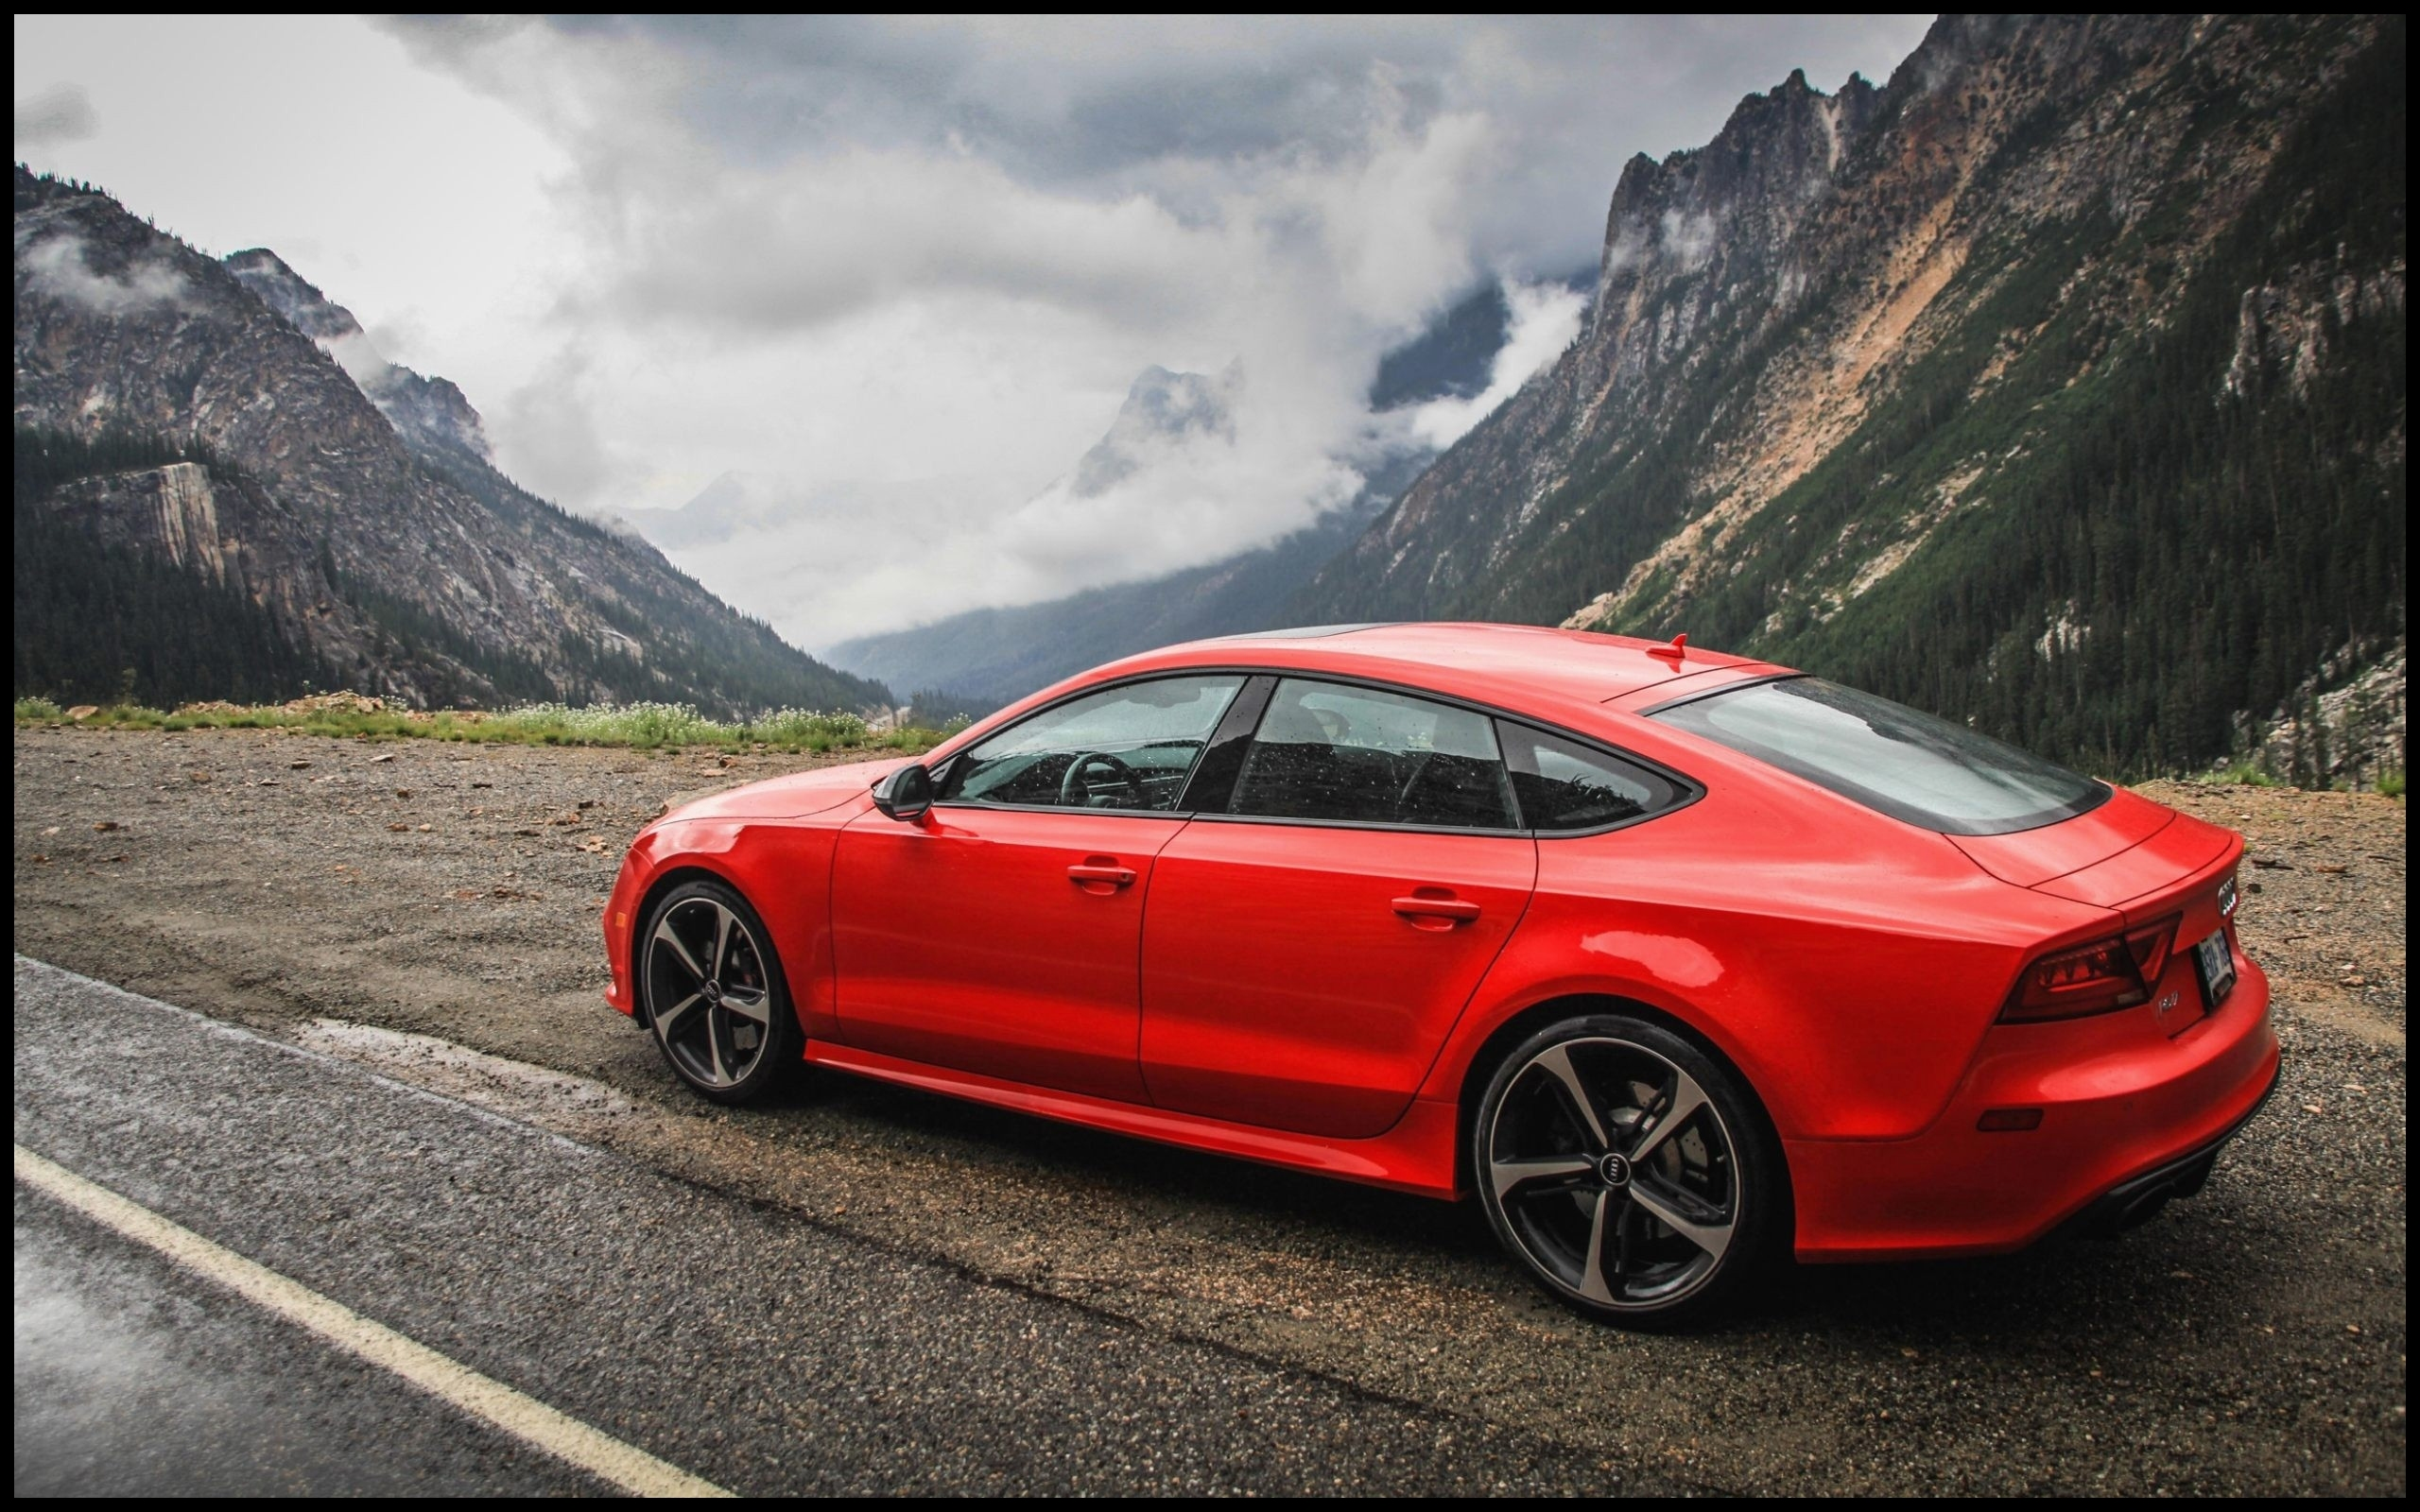 Audi S7 Interior Fresh Bmw X5 Interior 2016 Seats Best Bmw X5 3 0d M Pc Wallpaper 2560—1600 Bmw Wallpaper